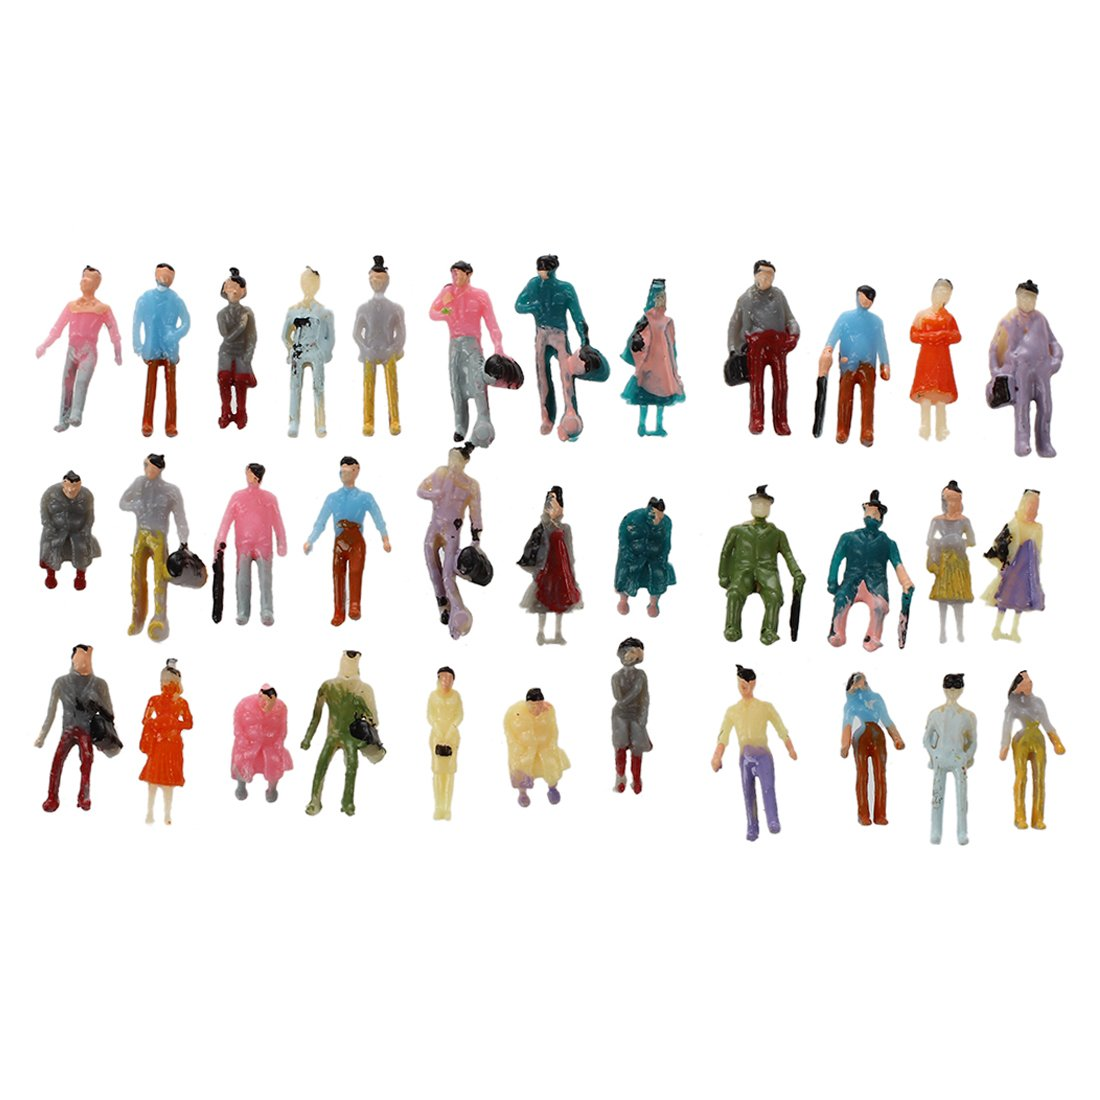 SODIAL R 100pcs Painted Model Train Passenger People Figures Scale 1:150